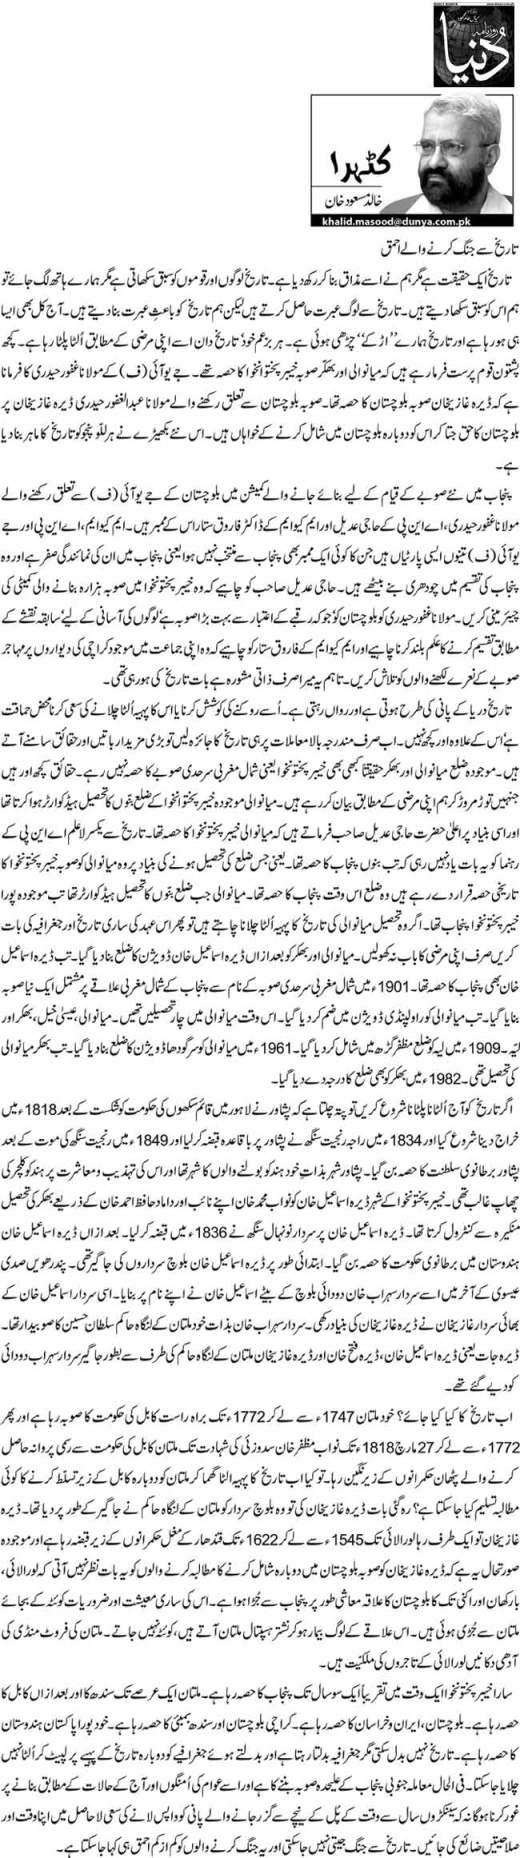 Tareekh se jang karnay walay aihmak - Khalid Masood Khan